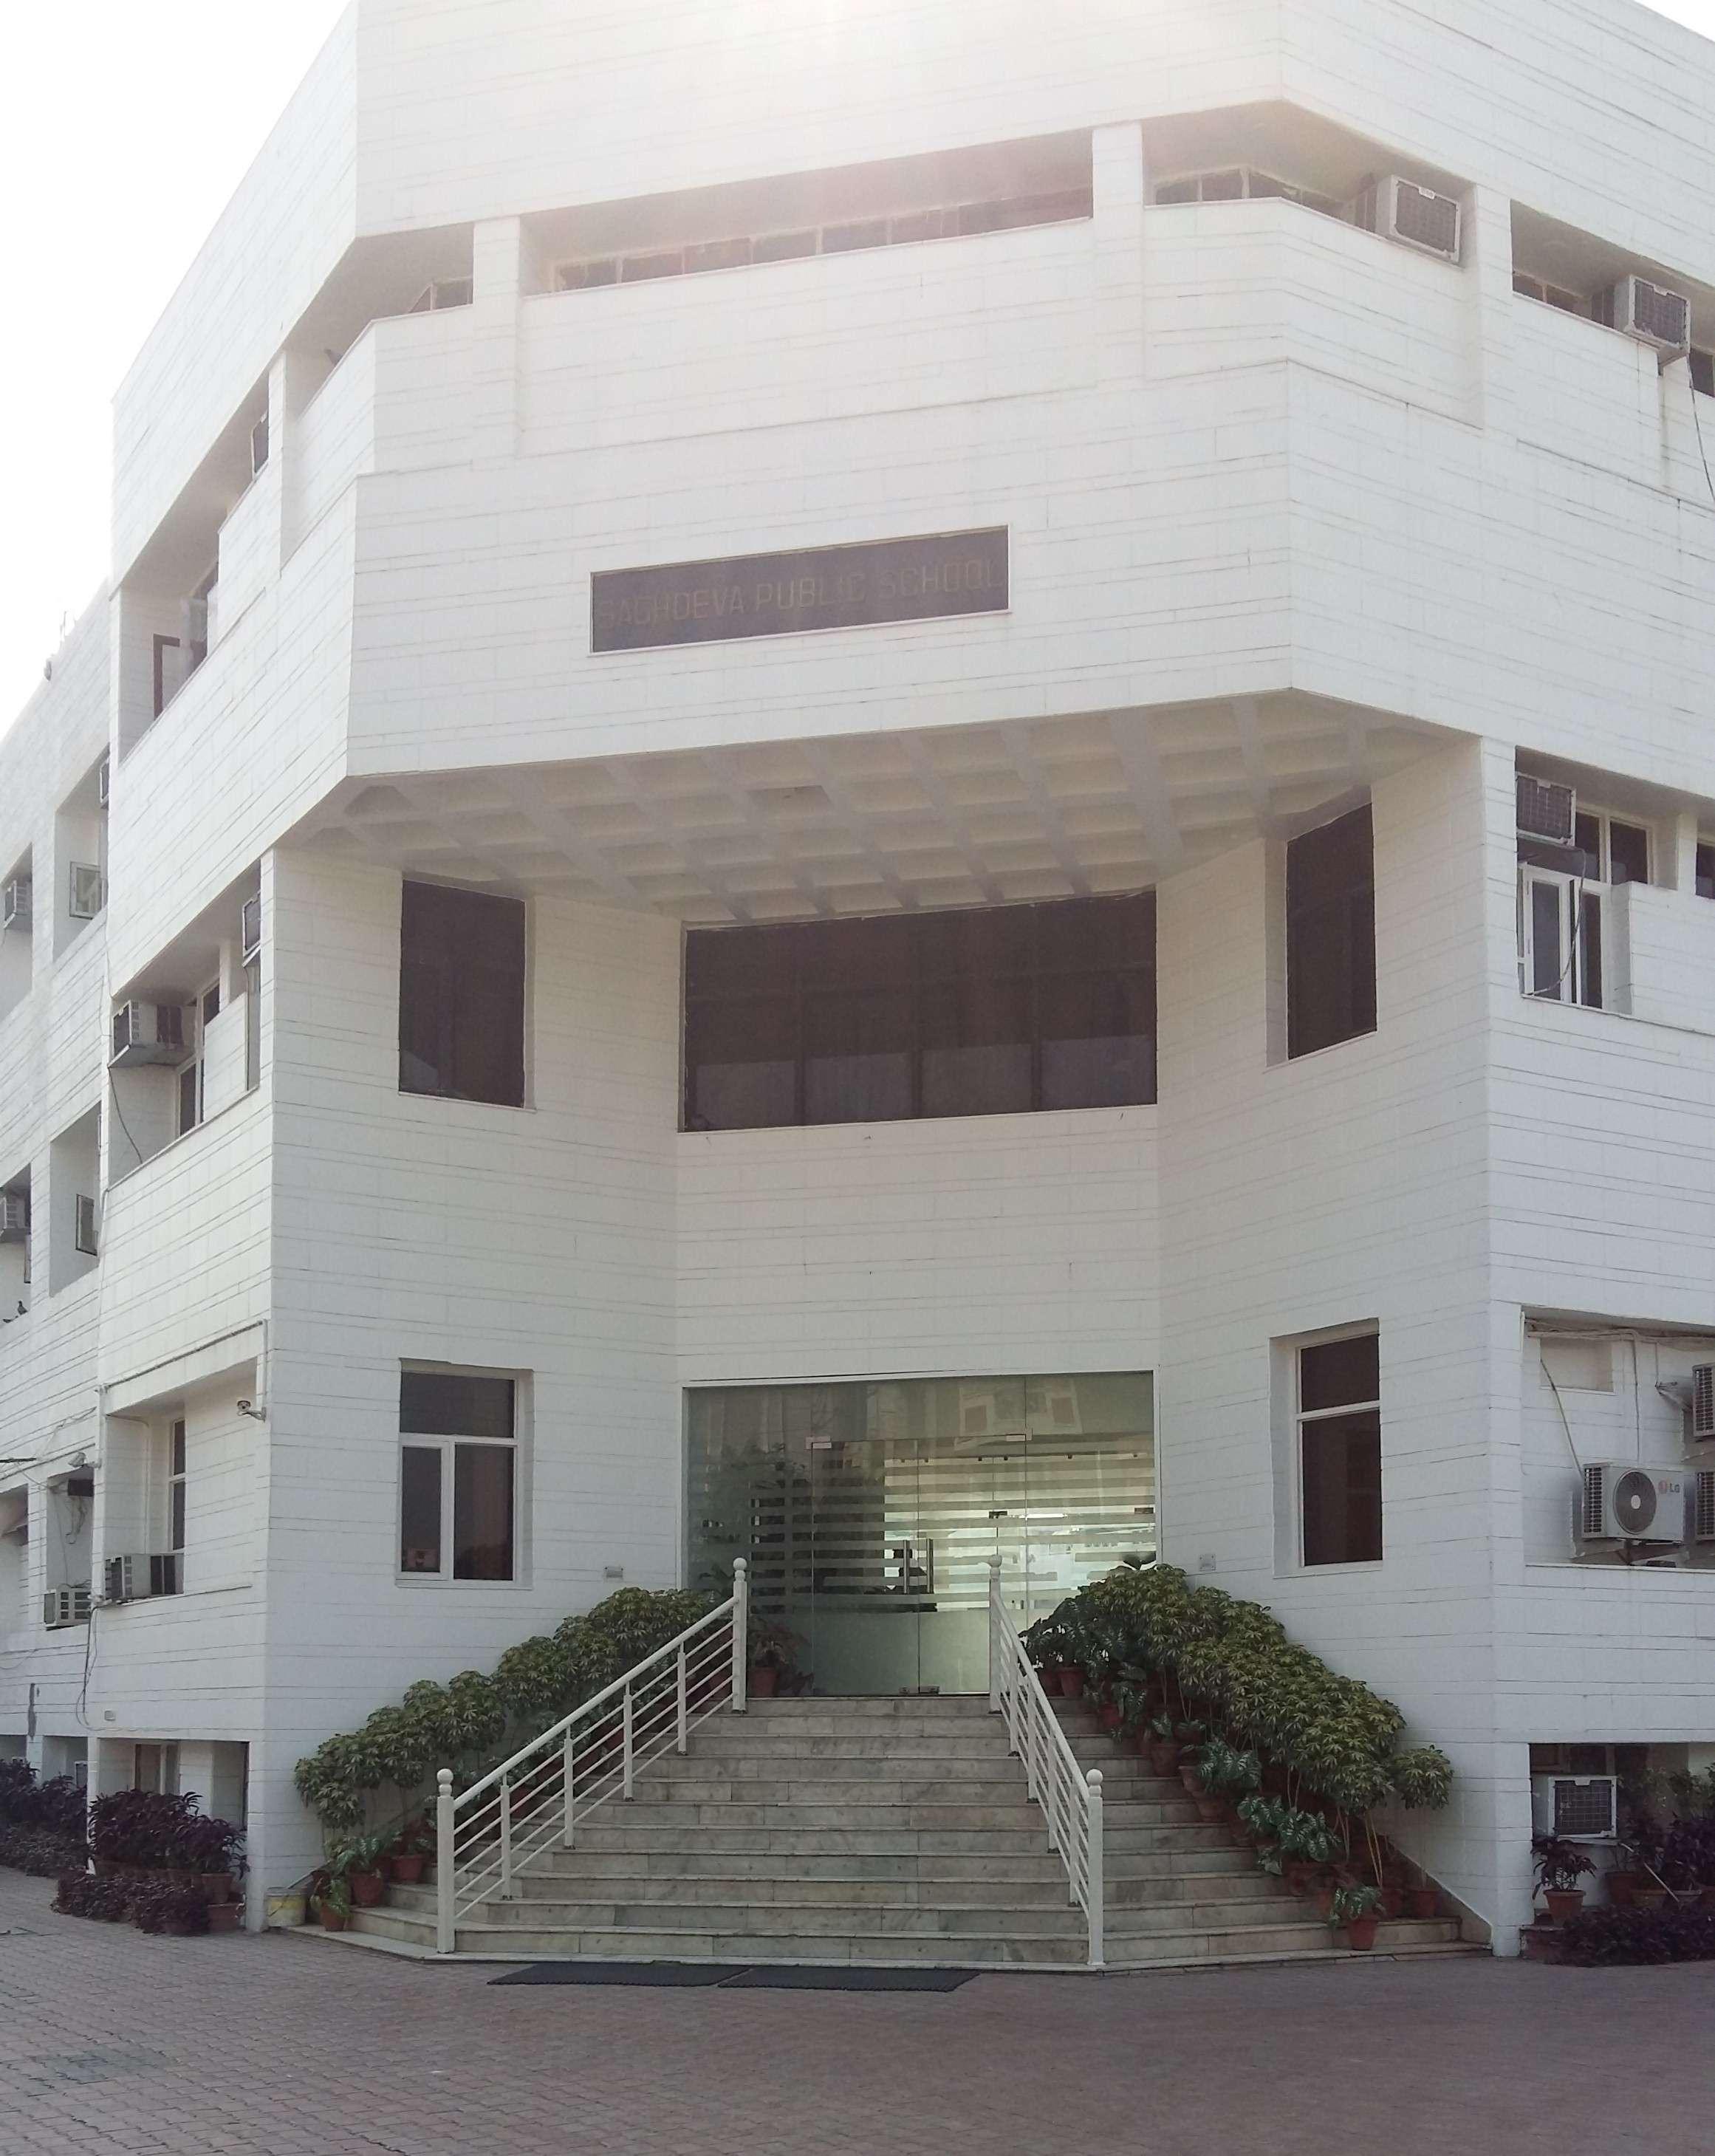 SACHDEVA PUBLIC SCHOOL FP BLOCK MAURYA ENCLAVE PITAMPURA DELHI 2730124